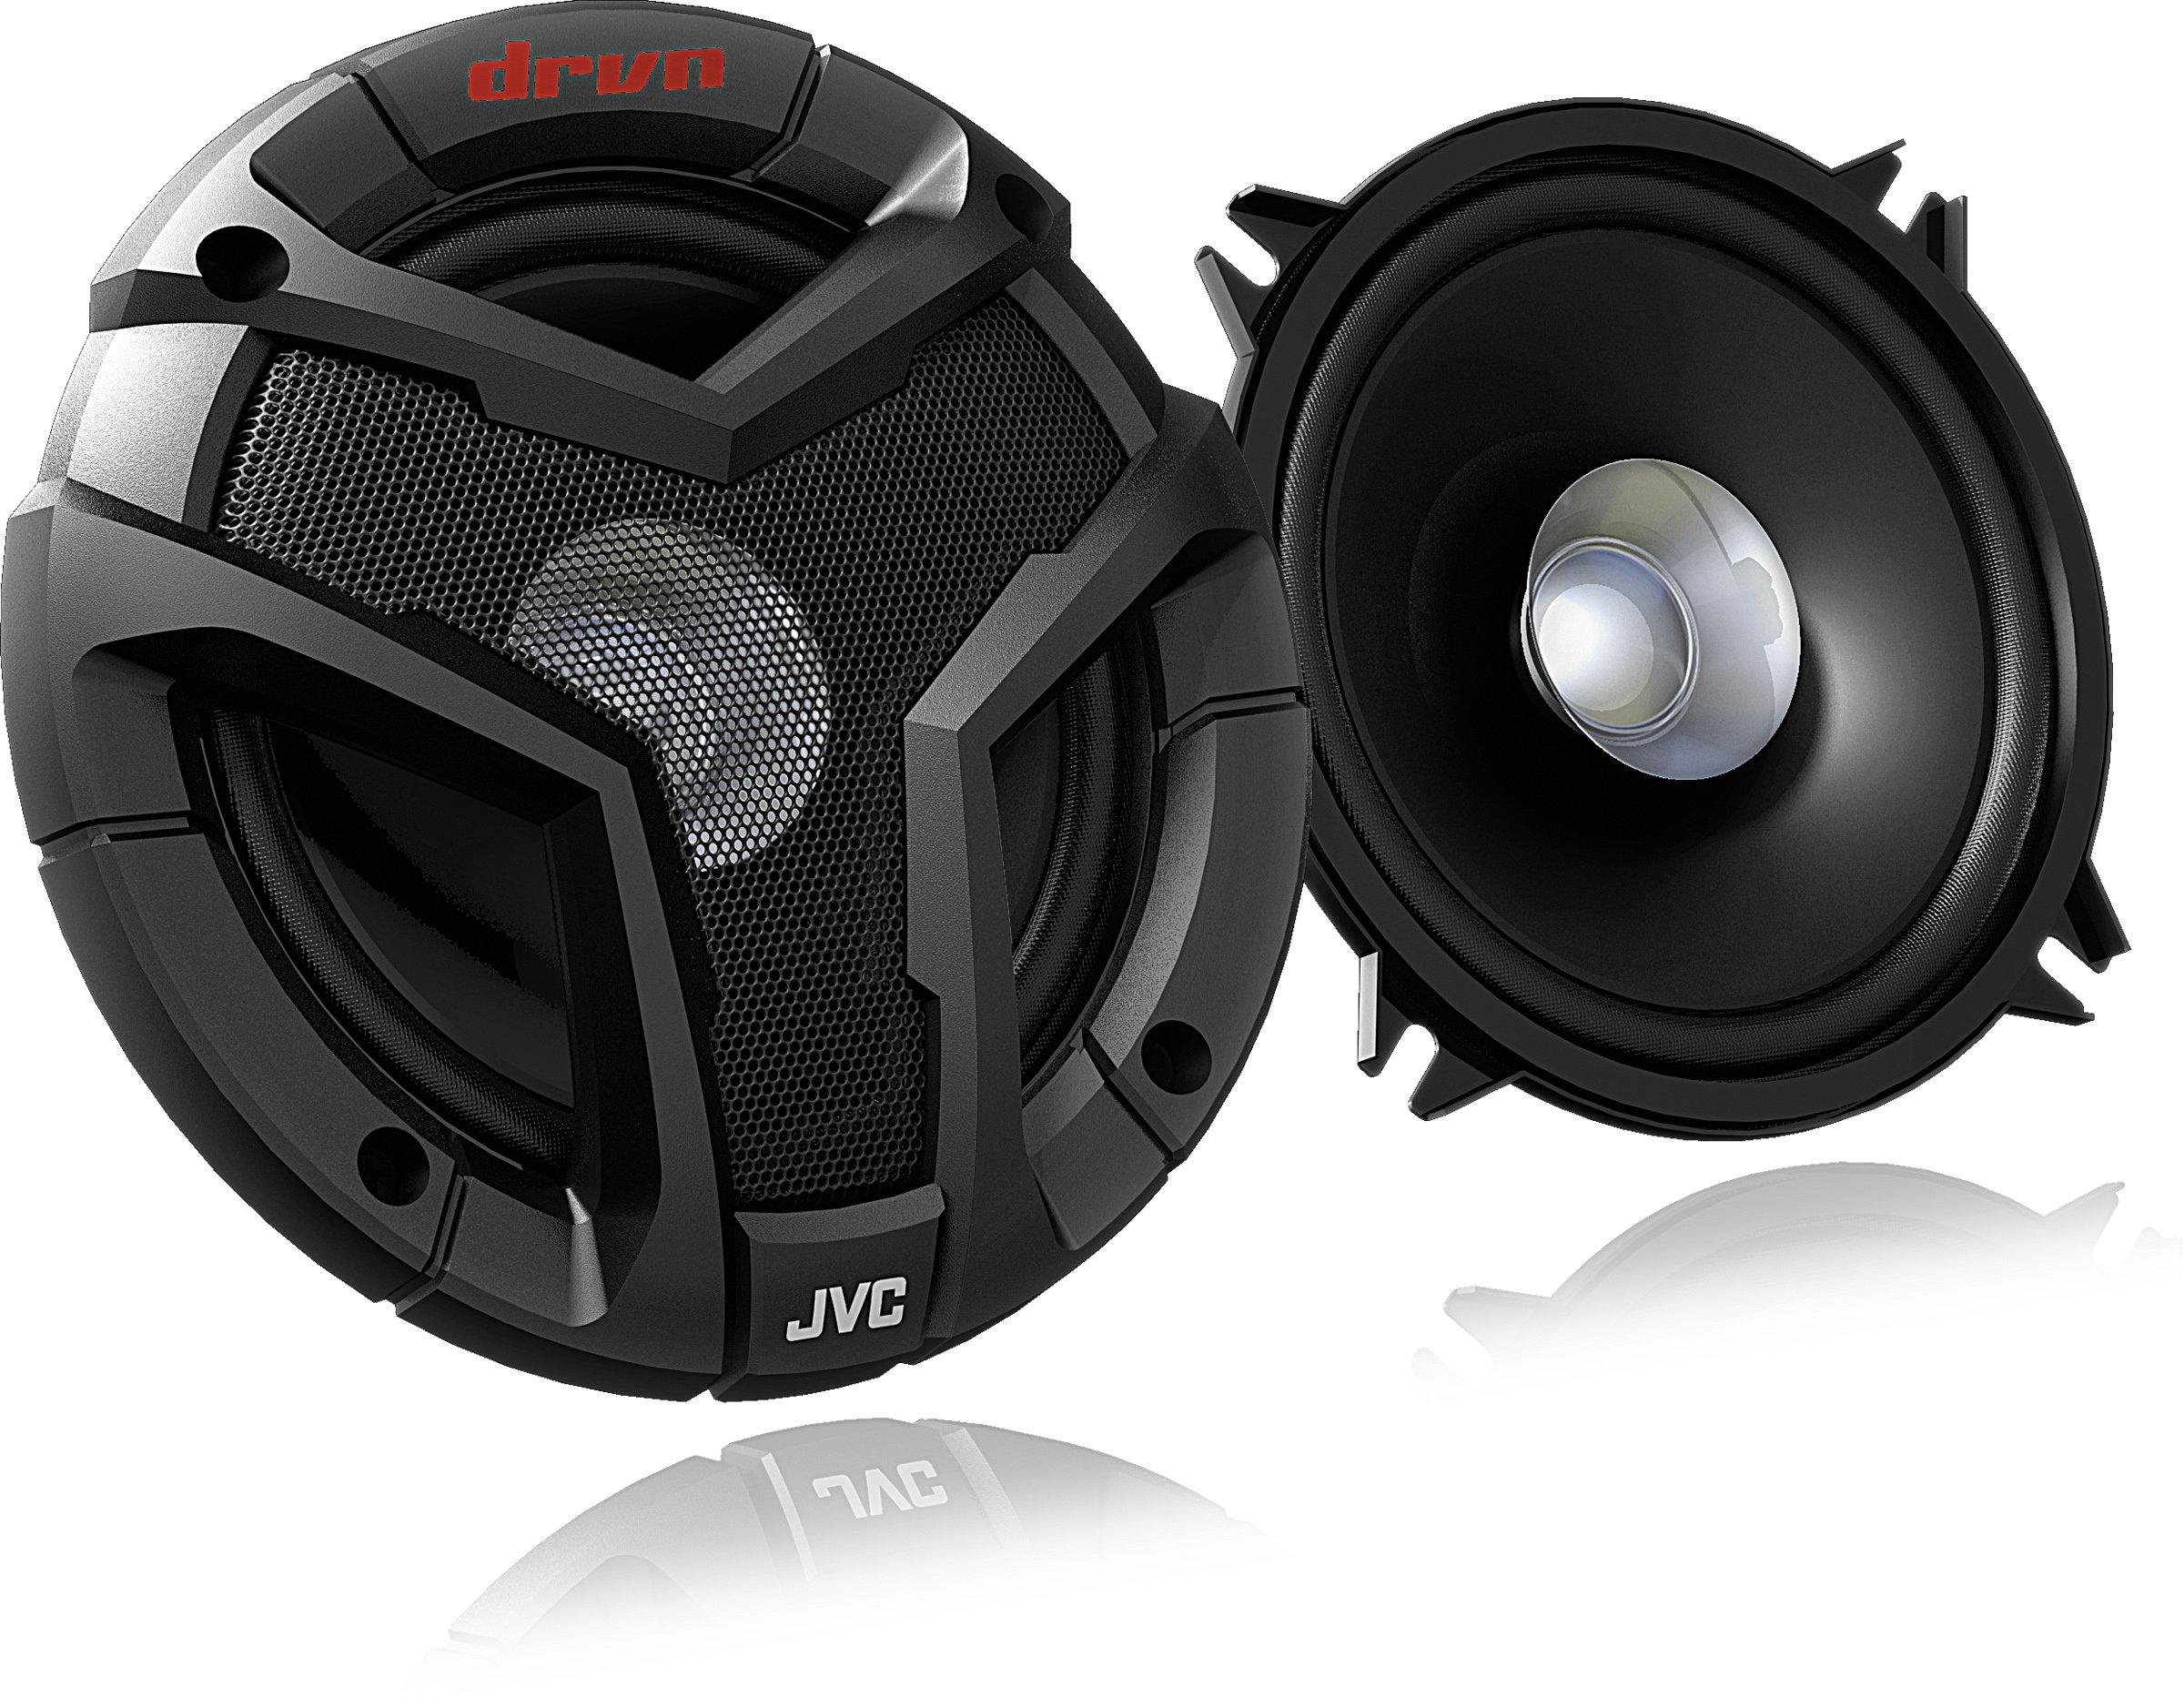 Altavoces para coche 90 Db, 200W, 25W, 13 cm, 450g, 4,4 cm JVC CS-V518 altavoz audio